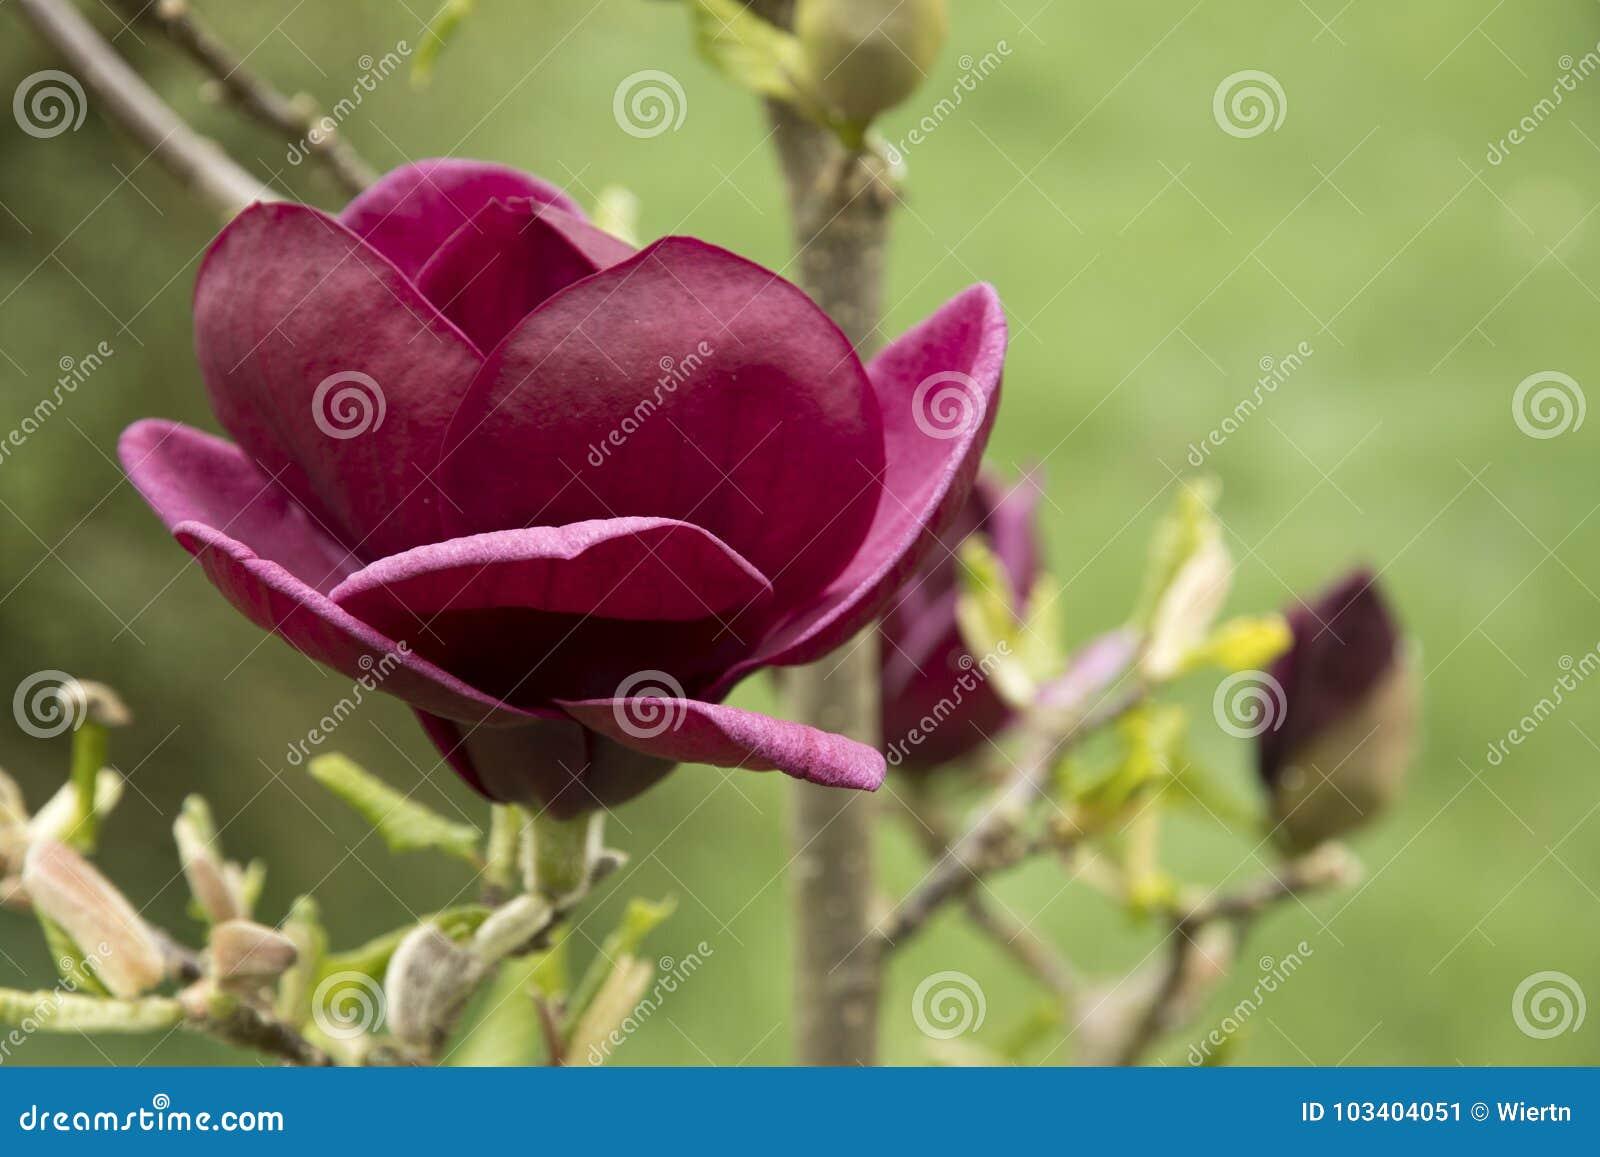 Magnolia Soulangeana X Liliiflora Genie Stock Image Image Of